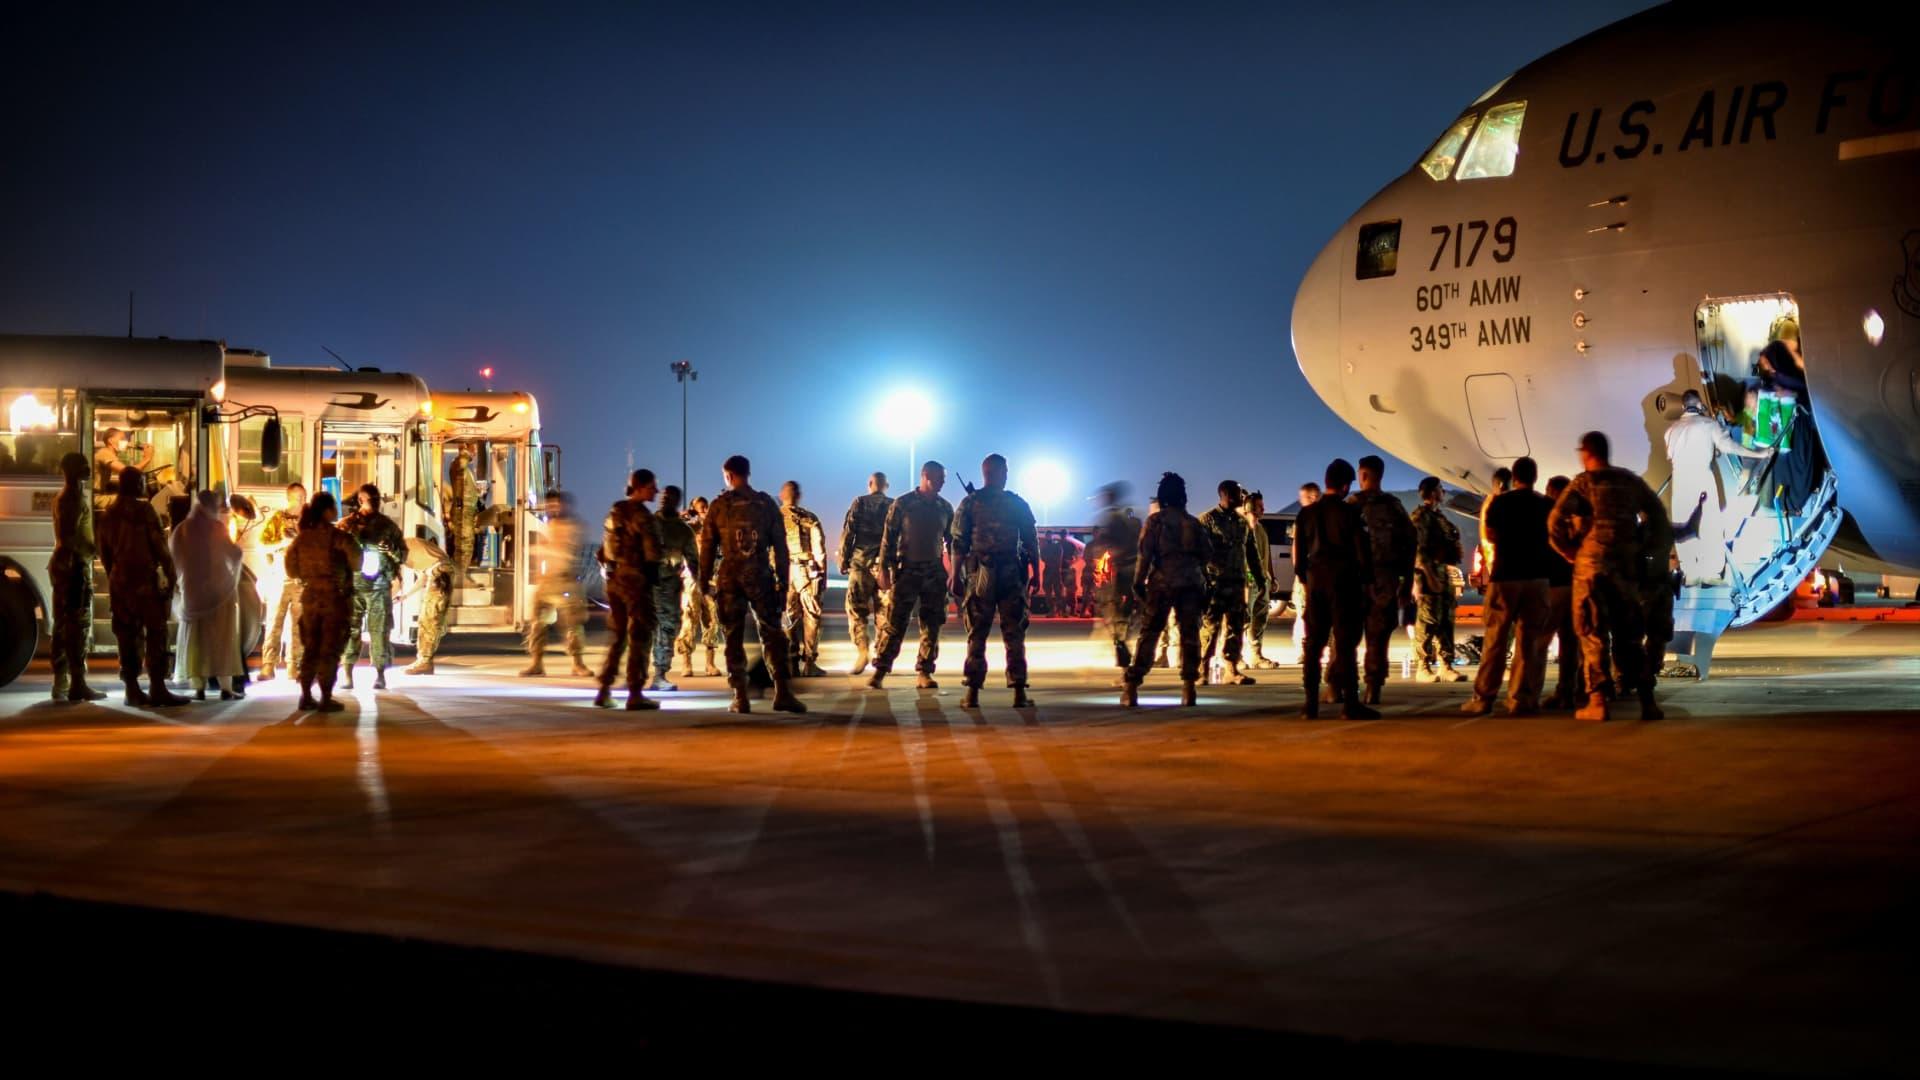 Afghan evacuees leave a U.S. Air Force C-17 cargo plane after arriving at Ali Al Salem Air Base in Kuwait on Aug. 24, 2021.